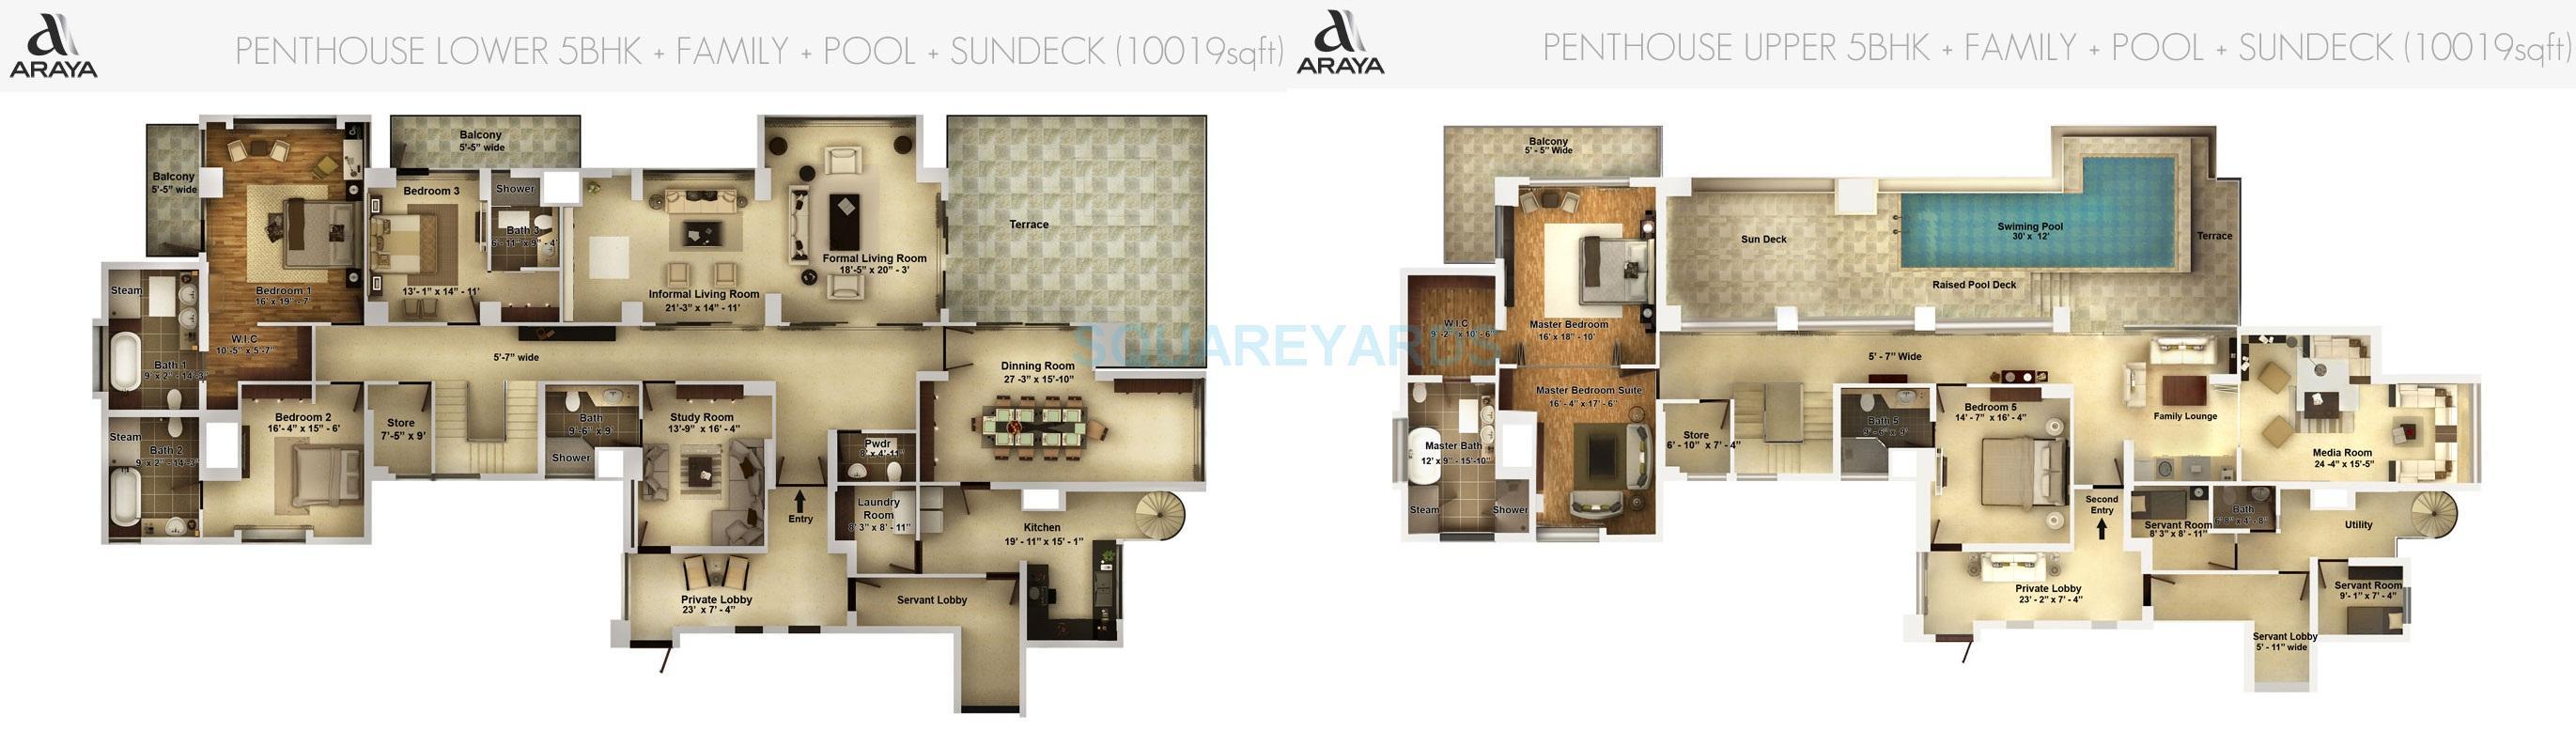 pioneer park araya penthouse 5bhk family pool 10019sqft 1